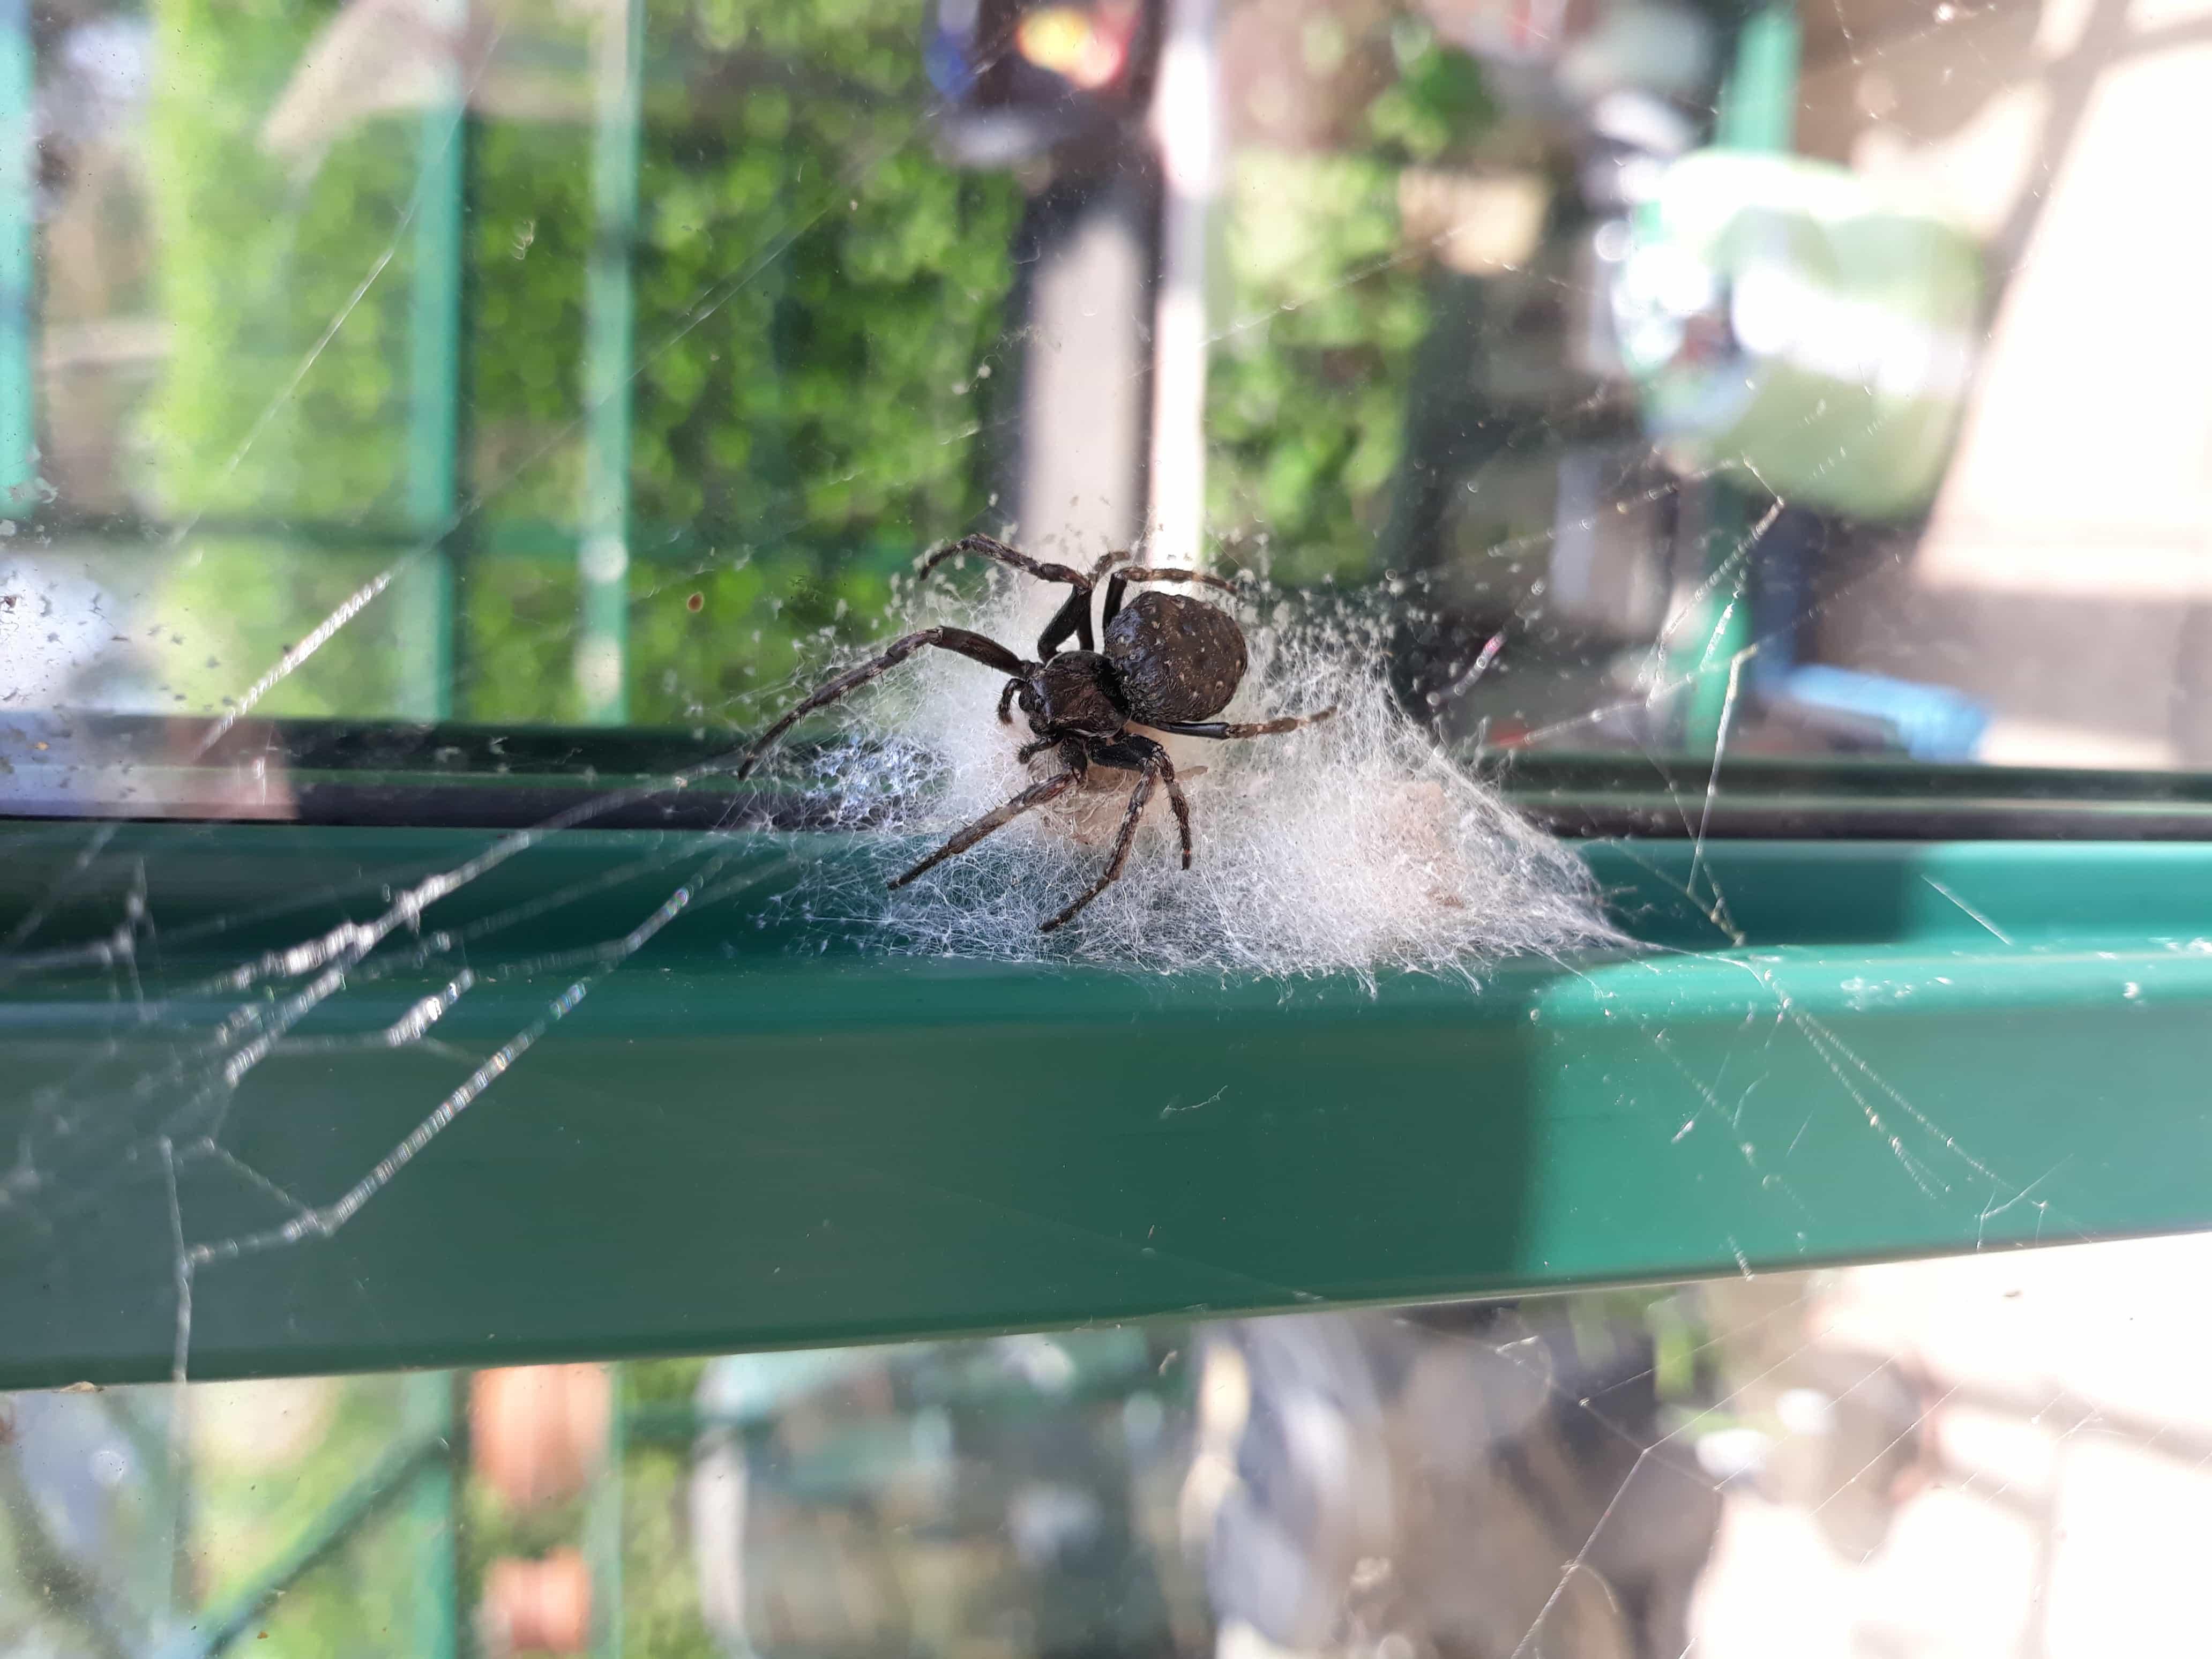 Picture of Nuctenea umbratica (Walnut Orb-weaver) - Female - Dorsal,Egg sacs,Webs